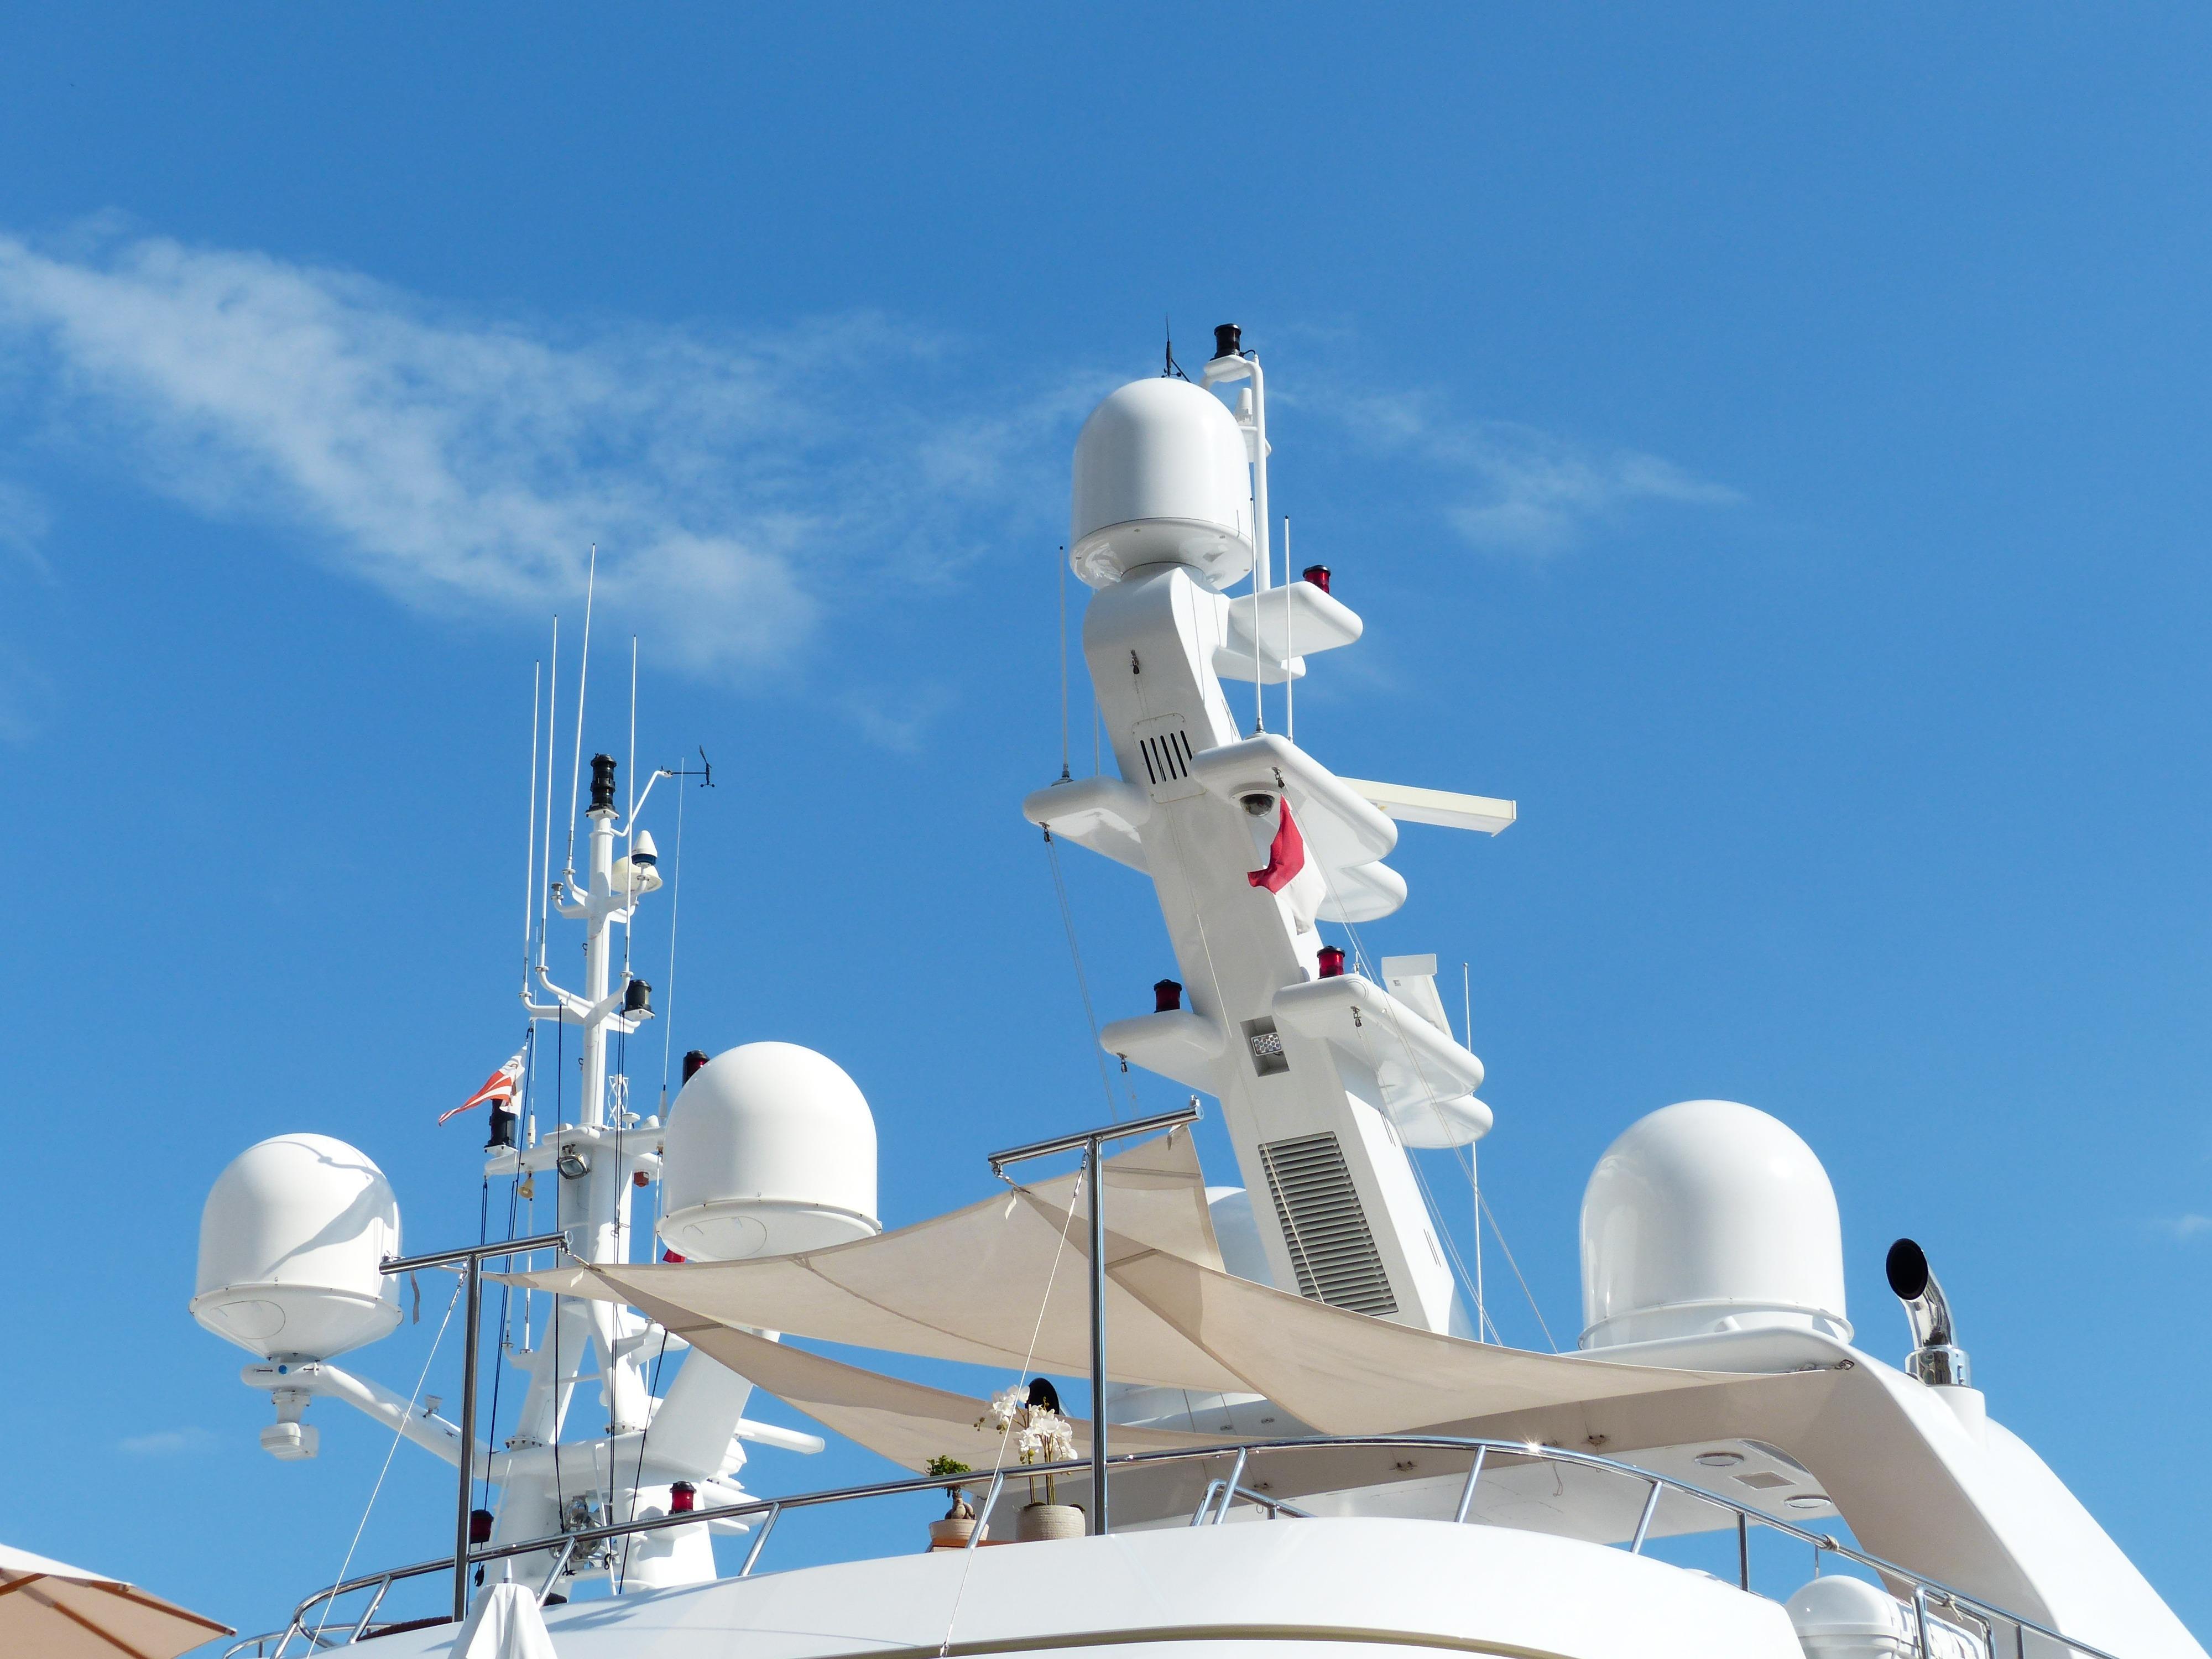 Free Images : boat, ship, boot, antenna, vehicle, mast, yacht ...